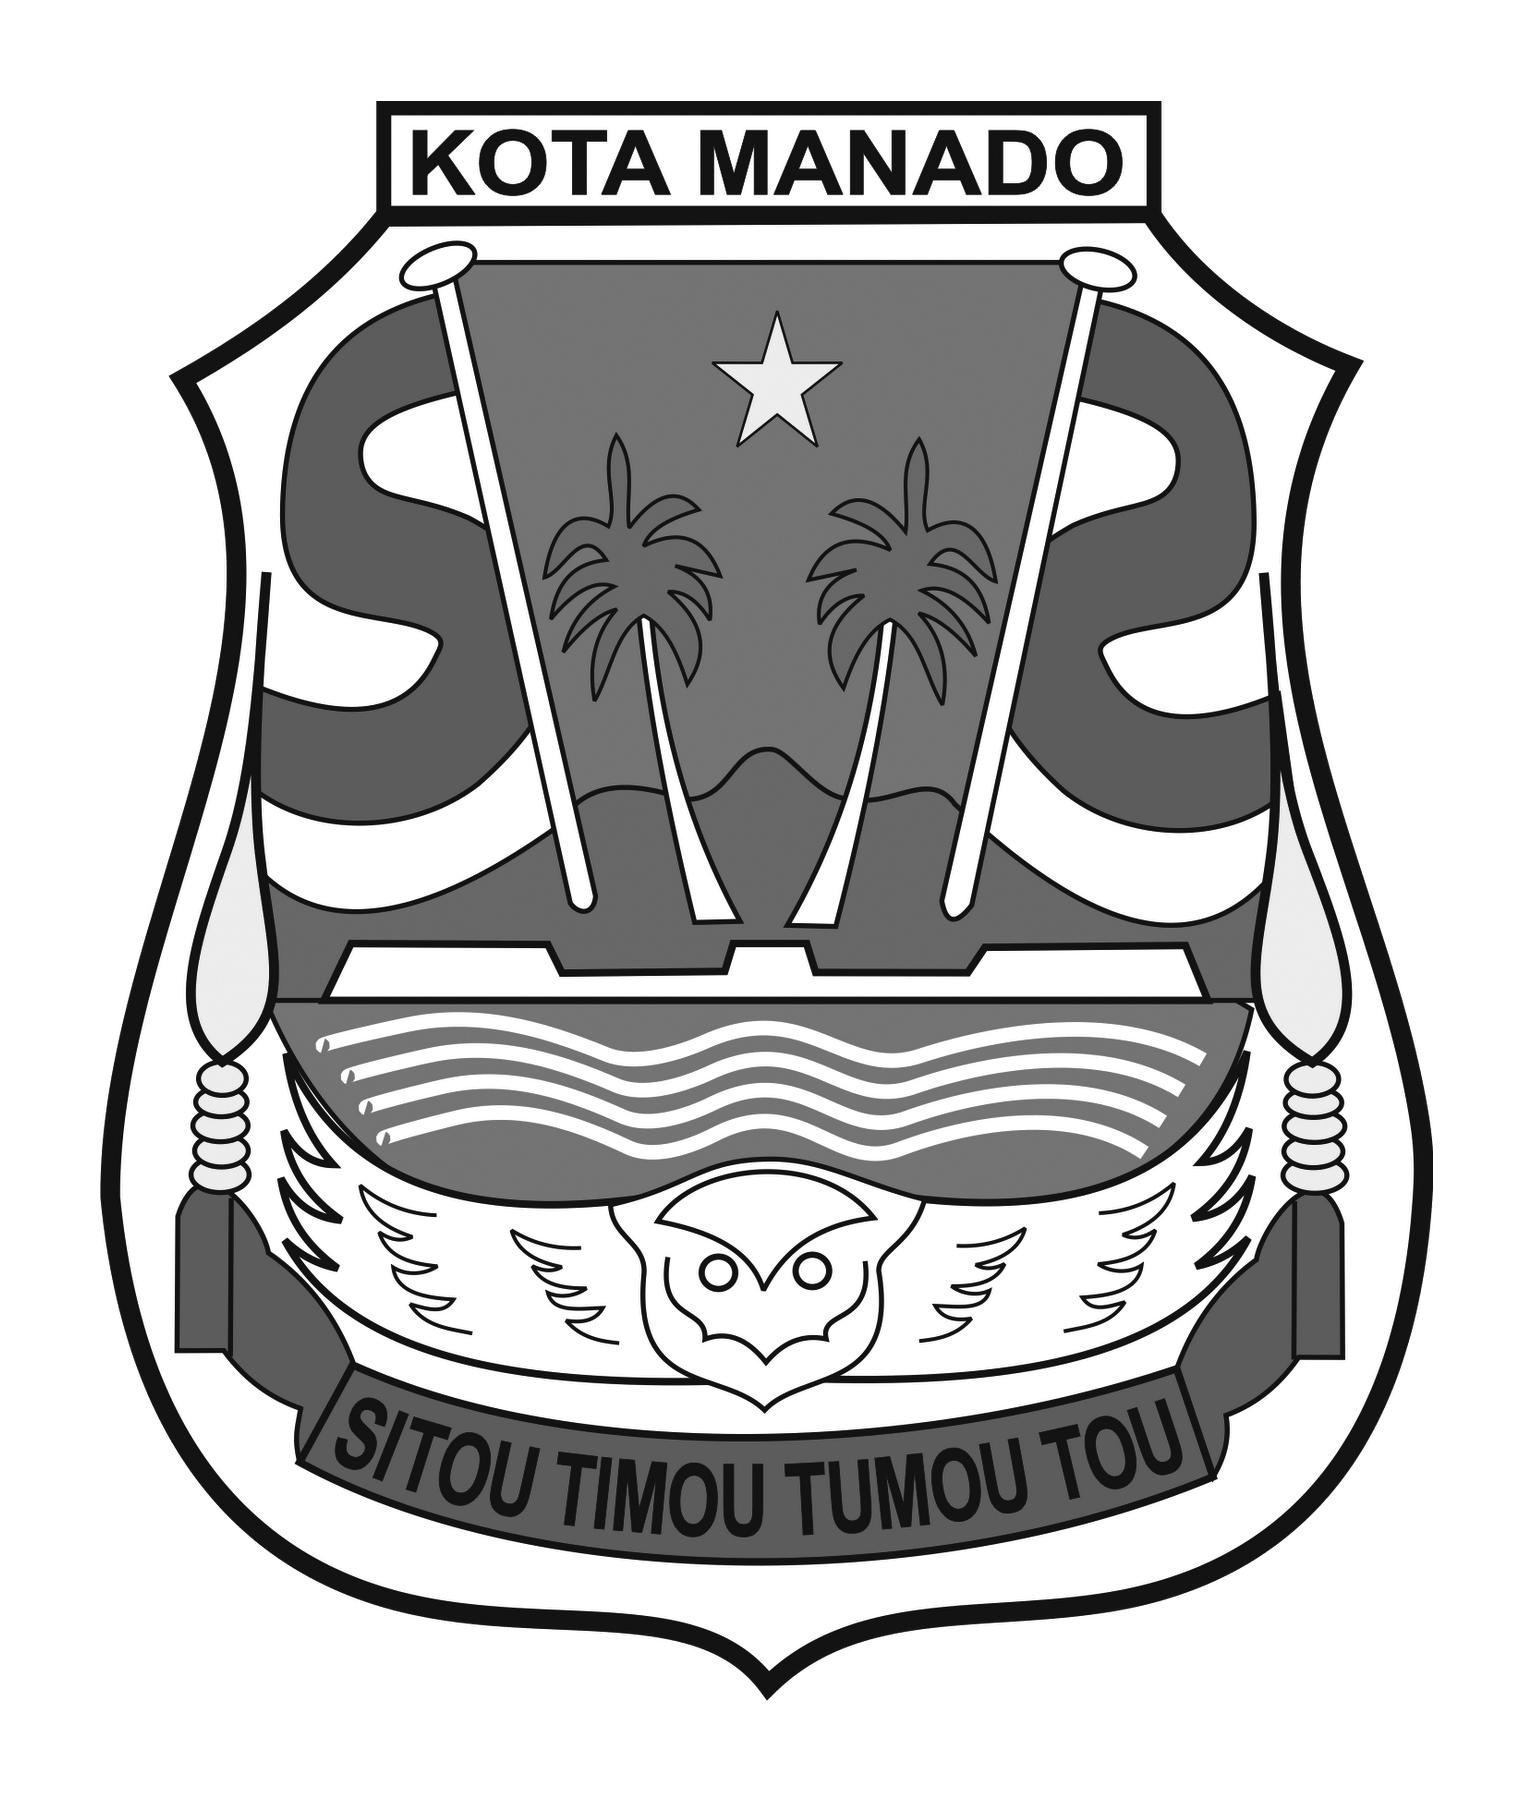 Logo Kota Manado (Provinsi Sulawesi Utara) Original Grayscale